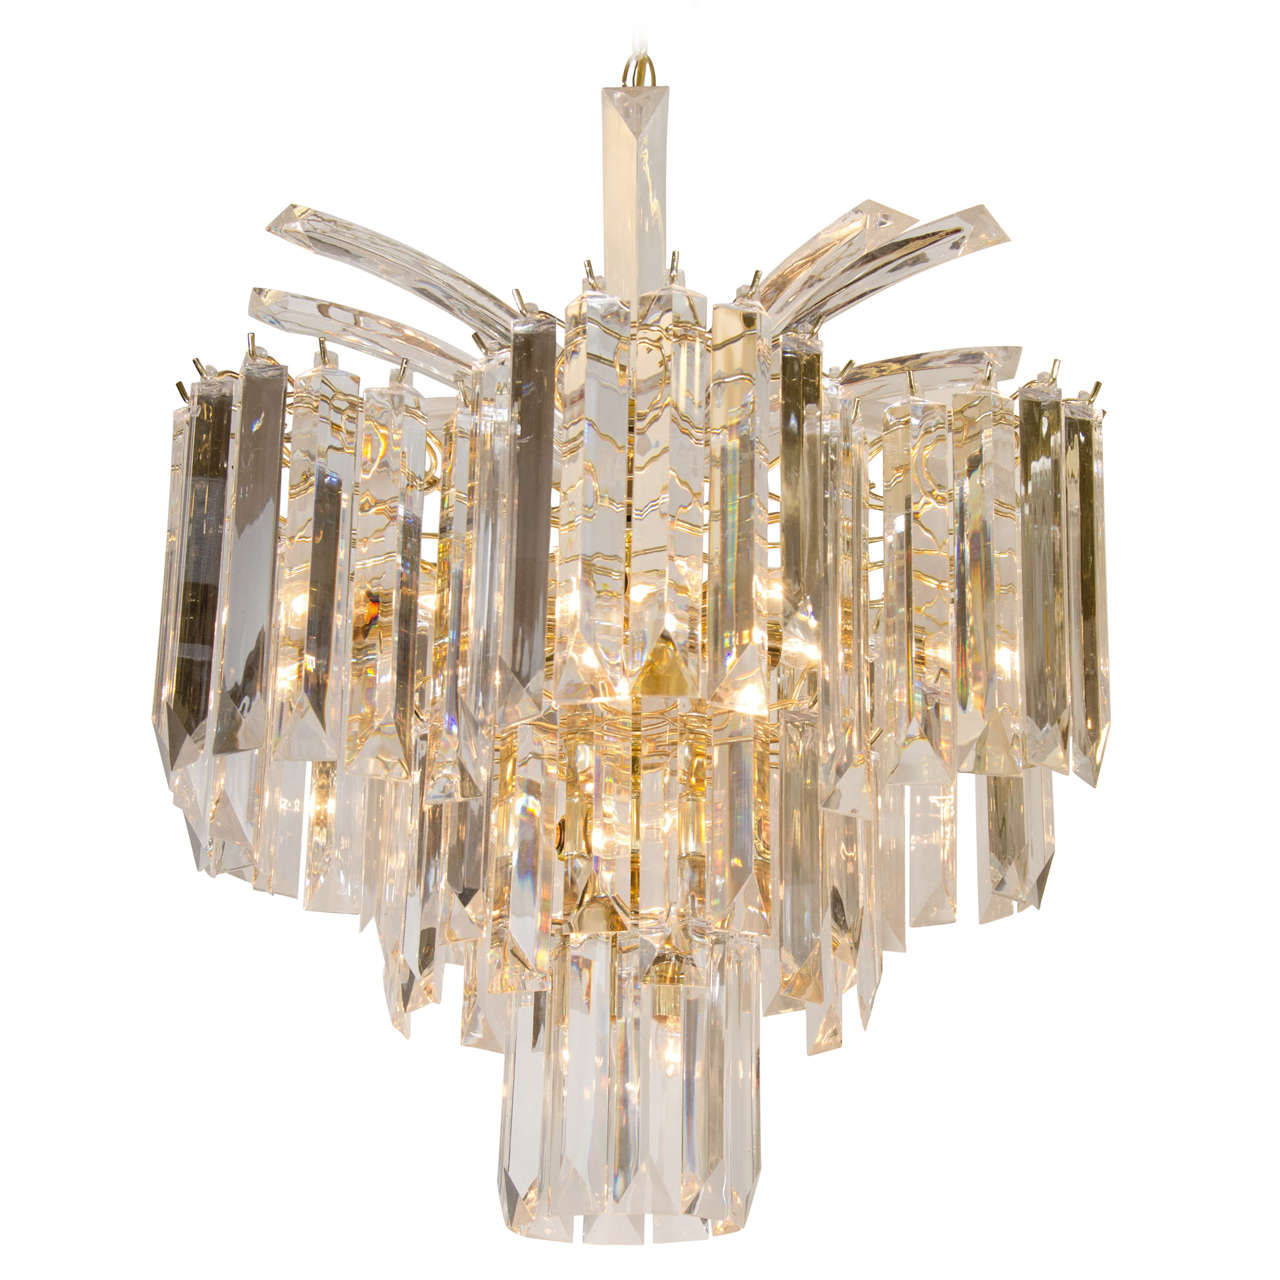 Camer Chandelier Gold Plated Palwa Crystal Prism